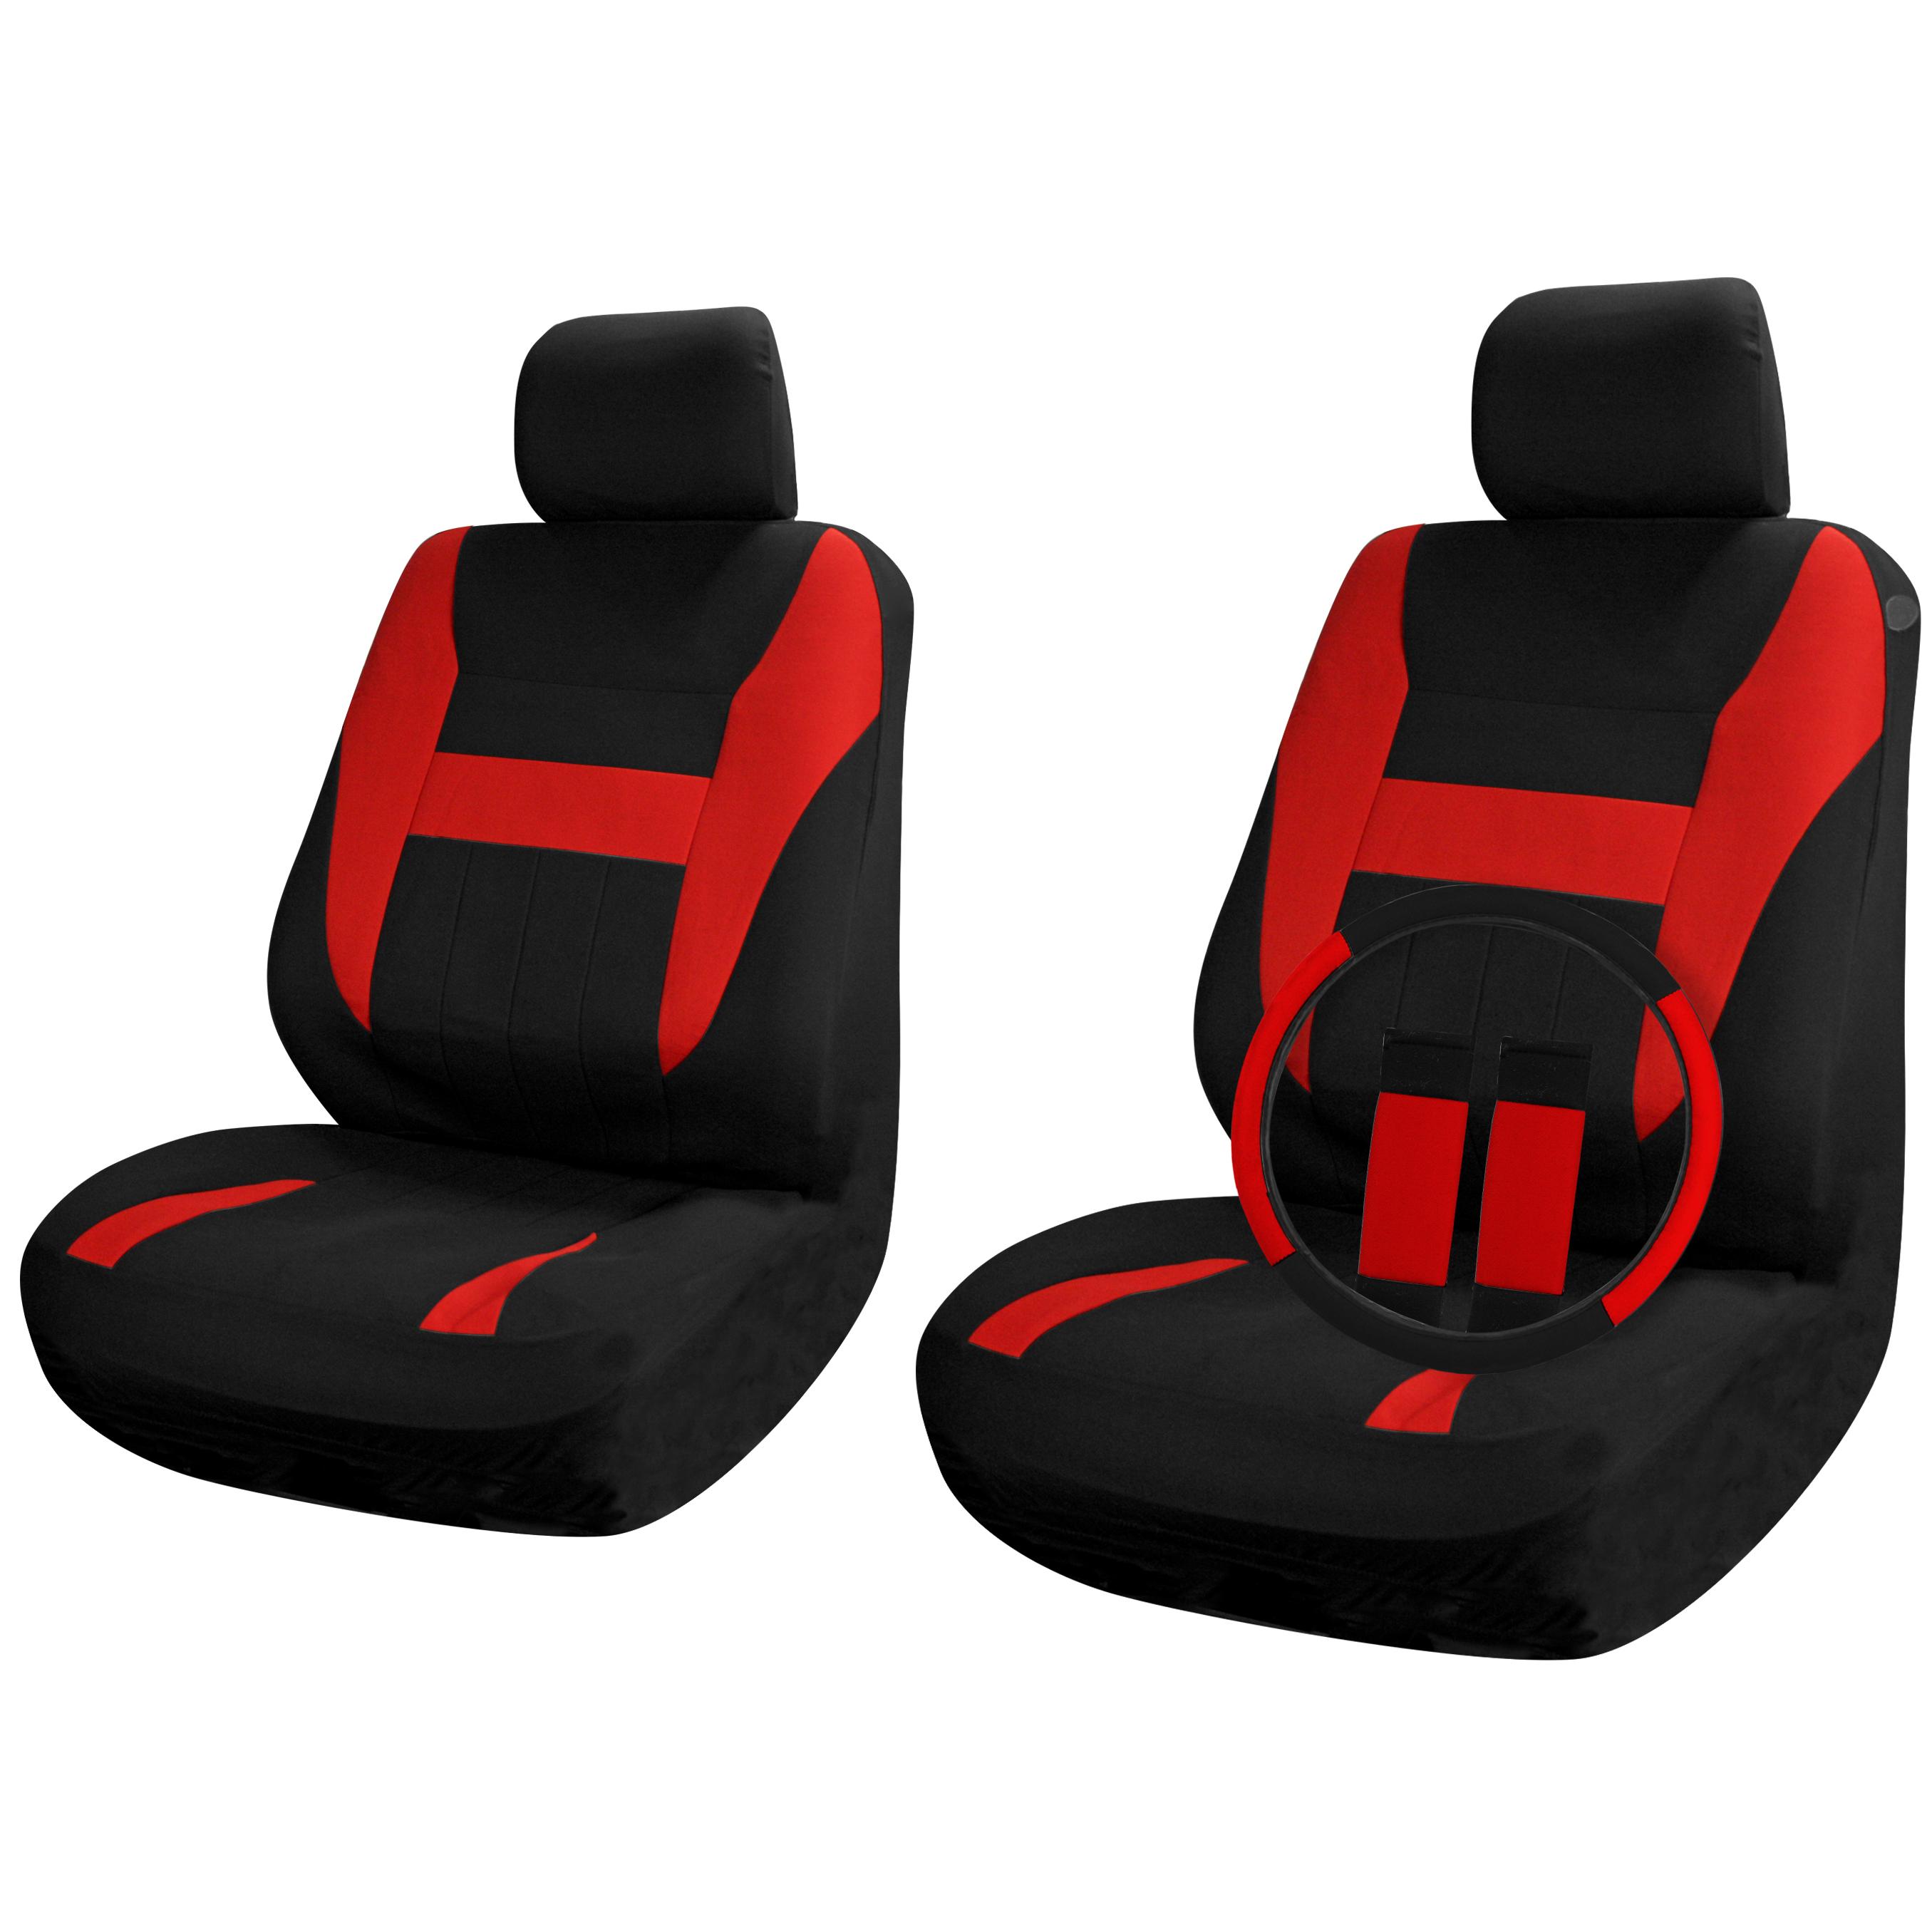 SUV Van Truck Seat Covers Set Bucket Seats Black Red 9pc